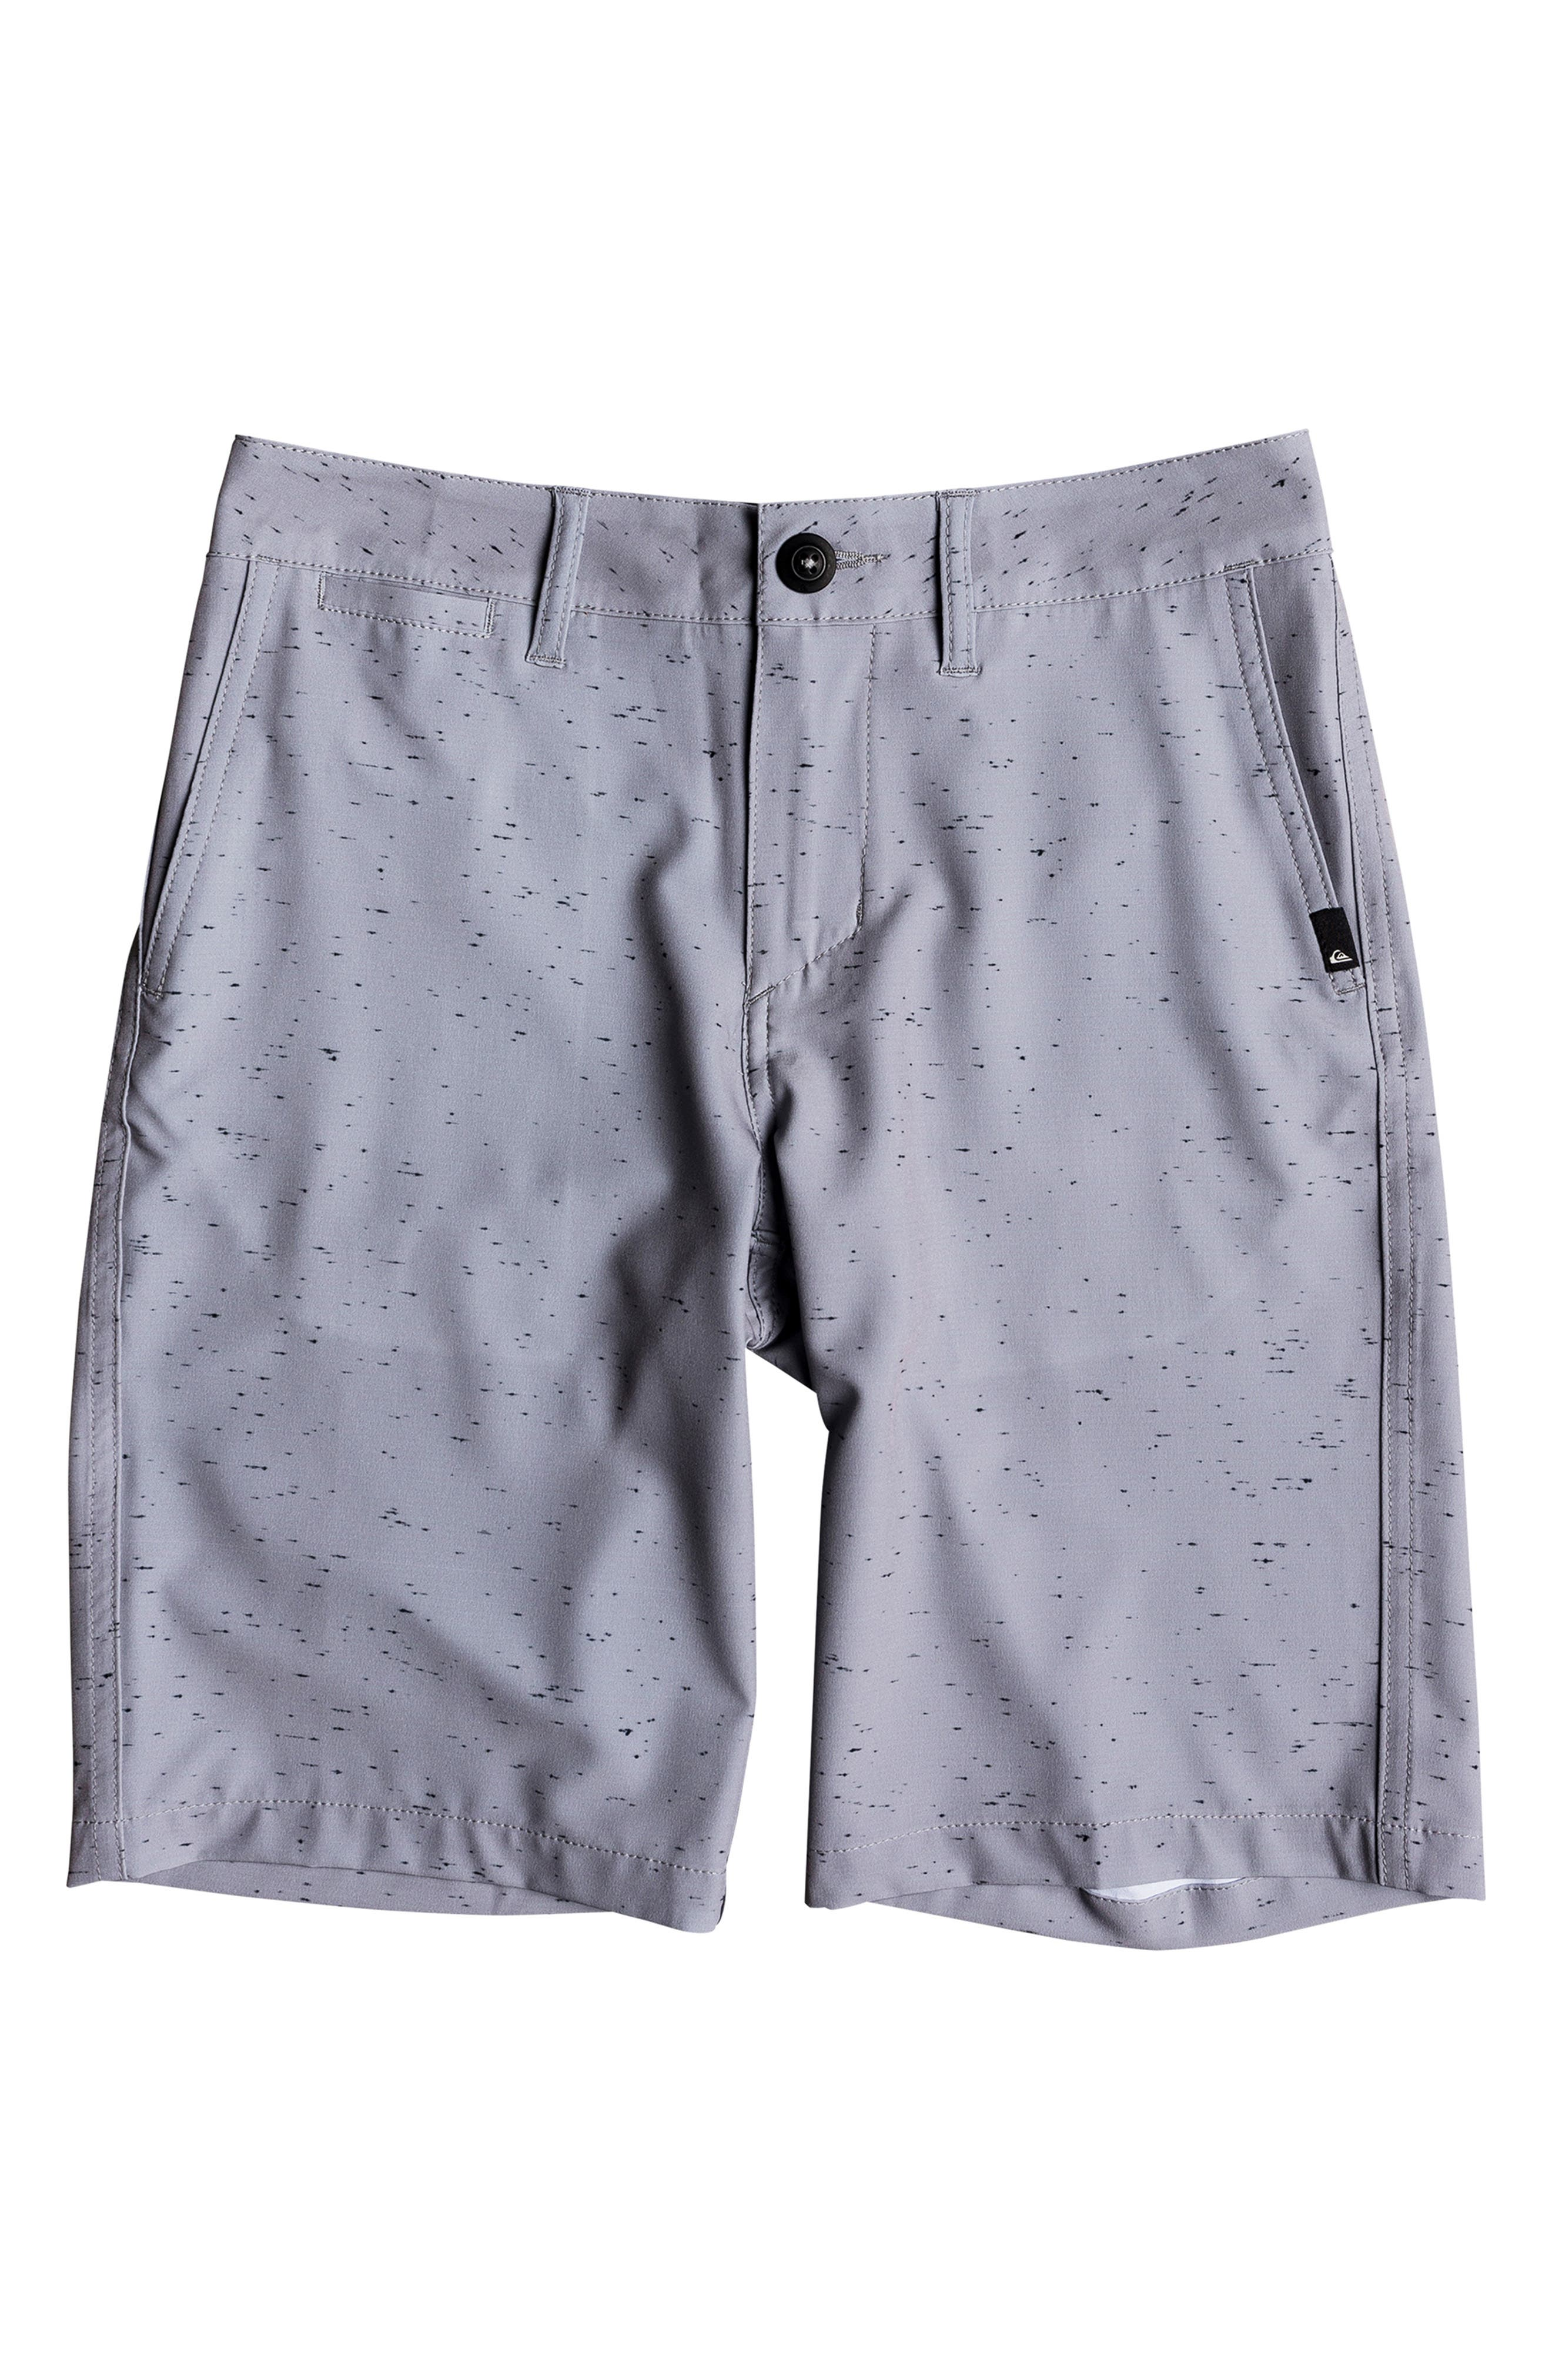 Union Nep Amphibian Hybrid Shorts,                             Main thumbnail 1, color,                             PLAGE